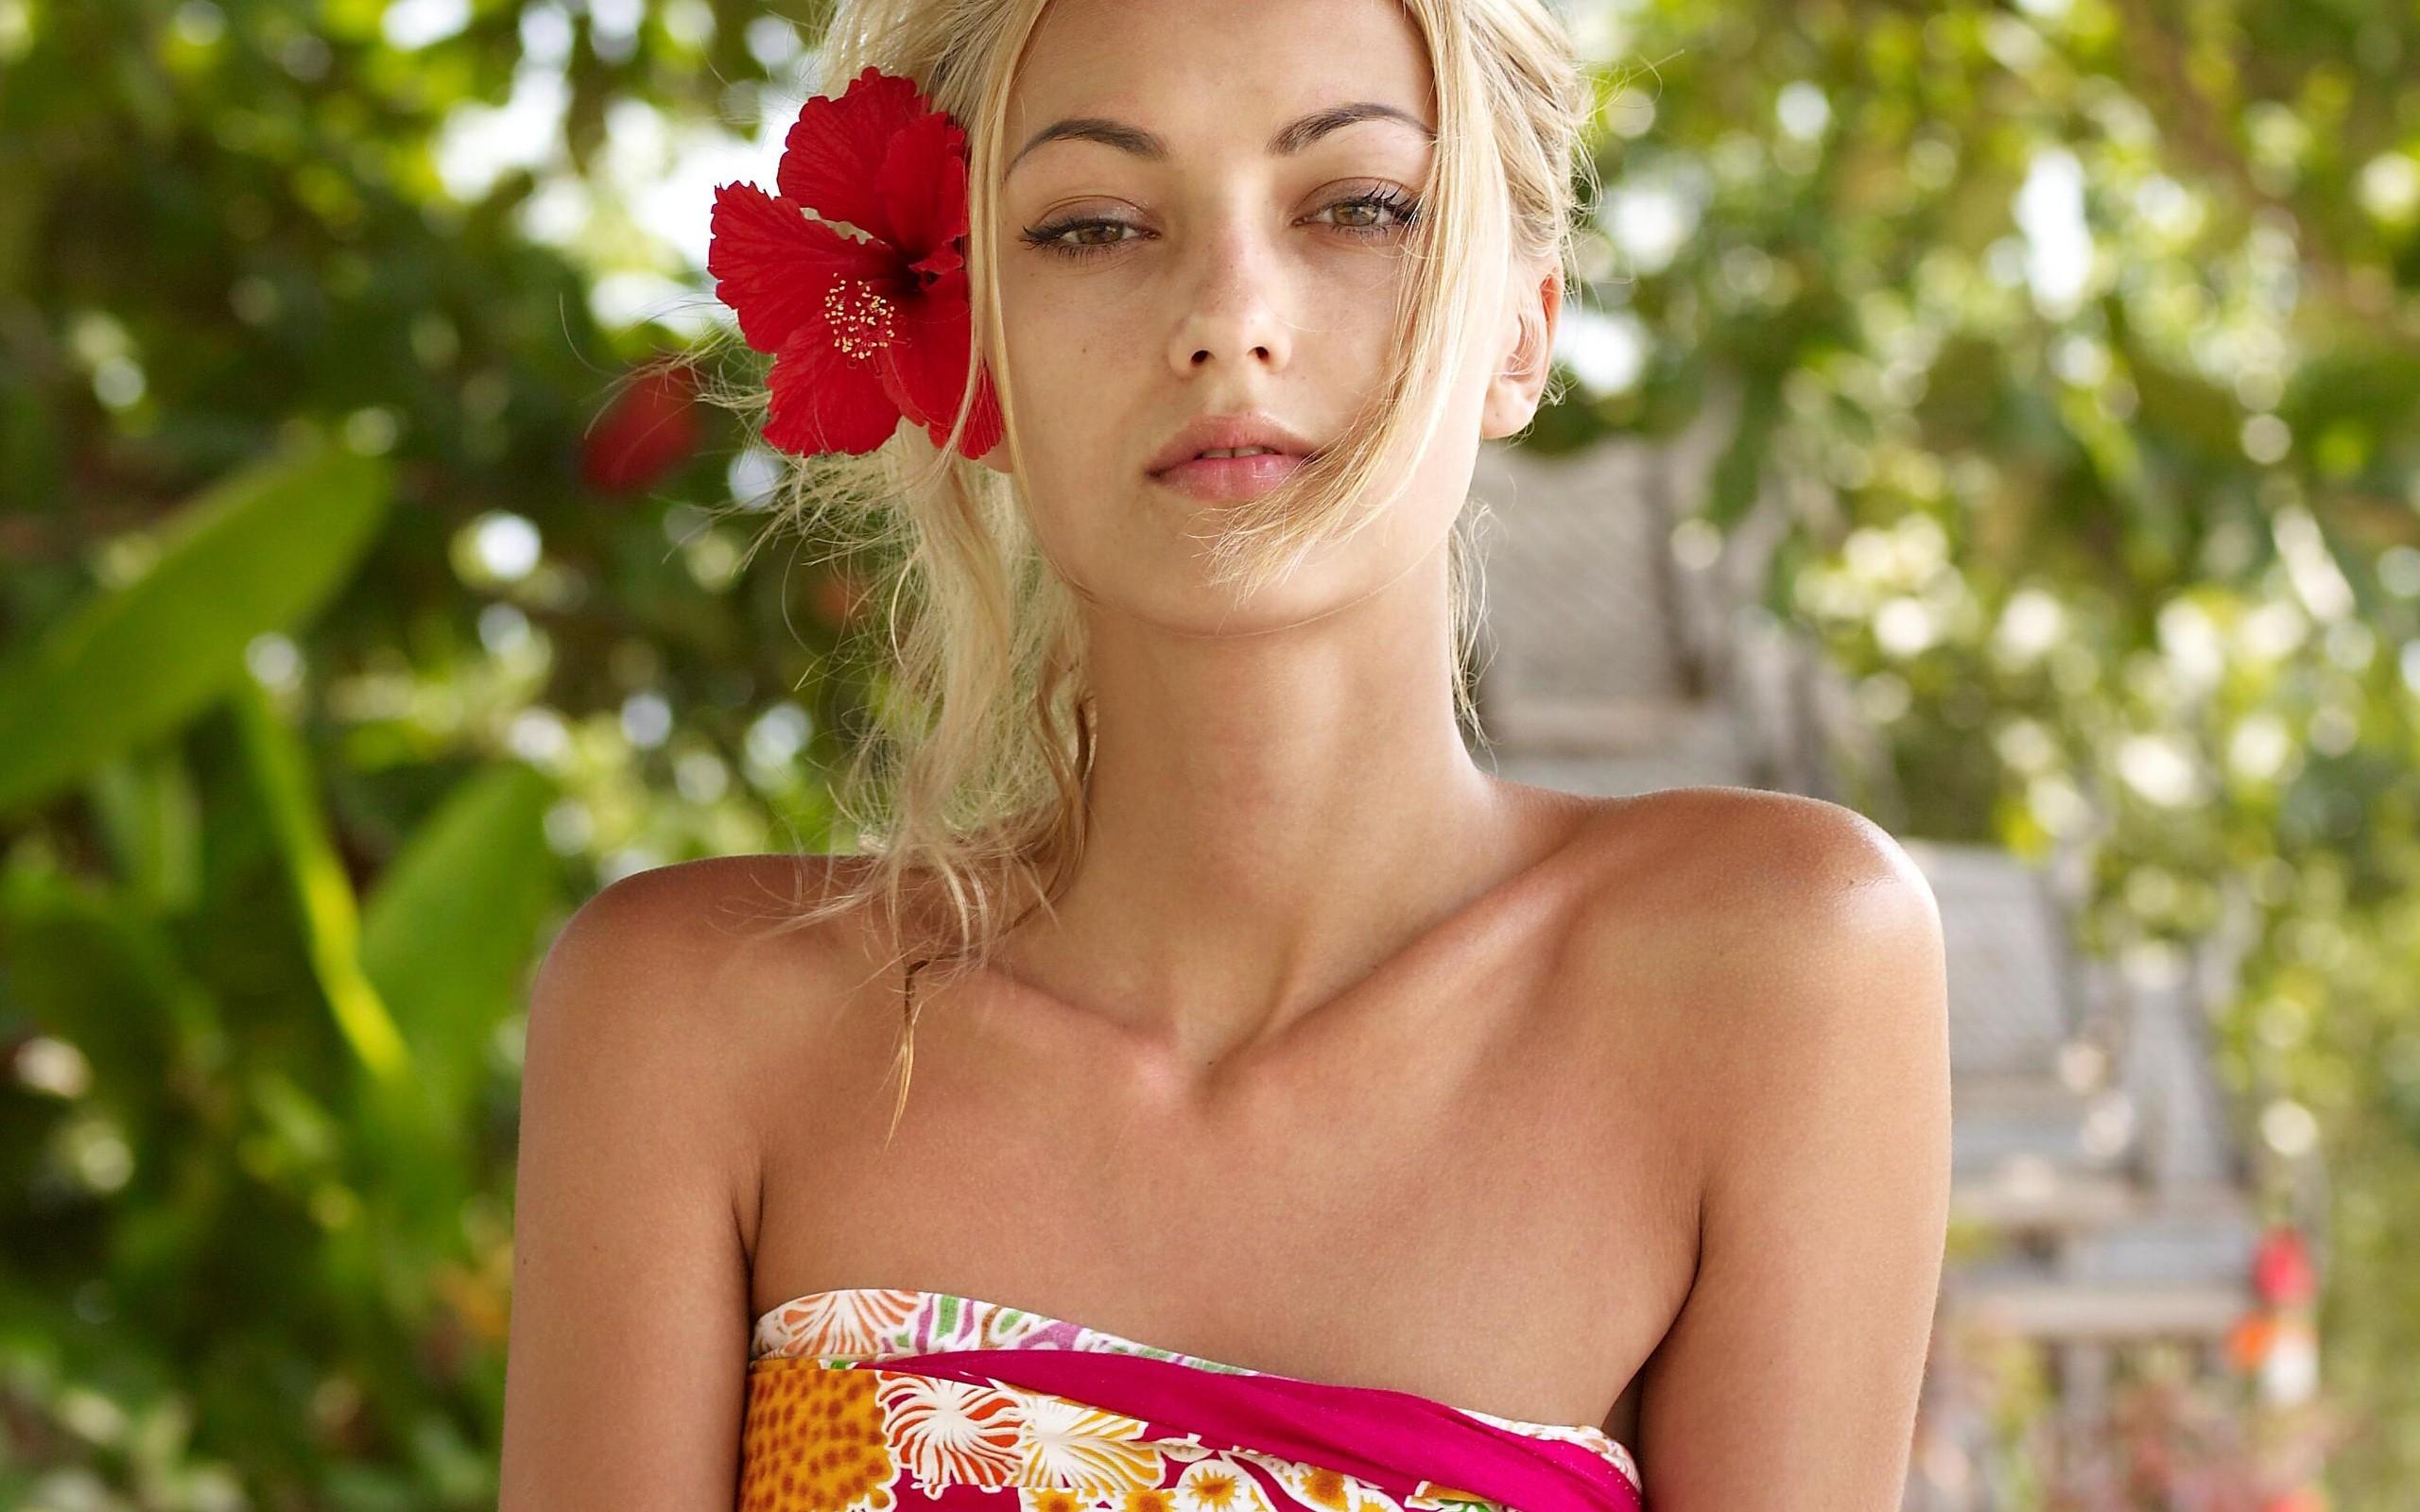 People 2560x1600 blonde women flower in hair Anna Sbitnaya  pornstar flowers plants bare shoulders women outdoors outdoors looking at viewer